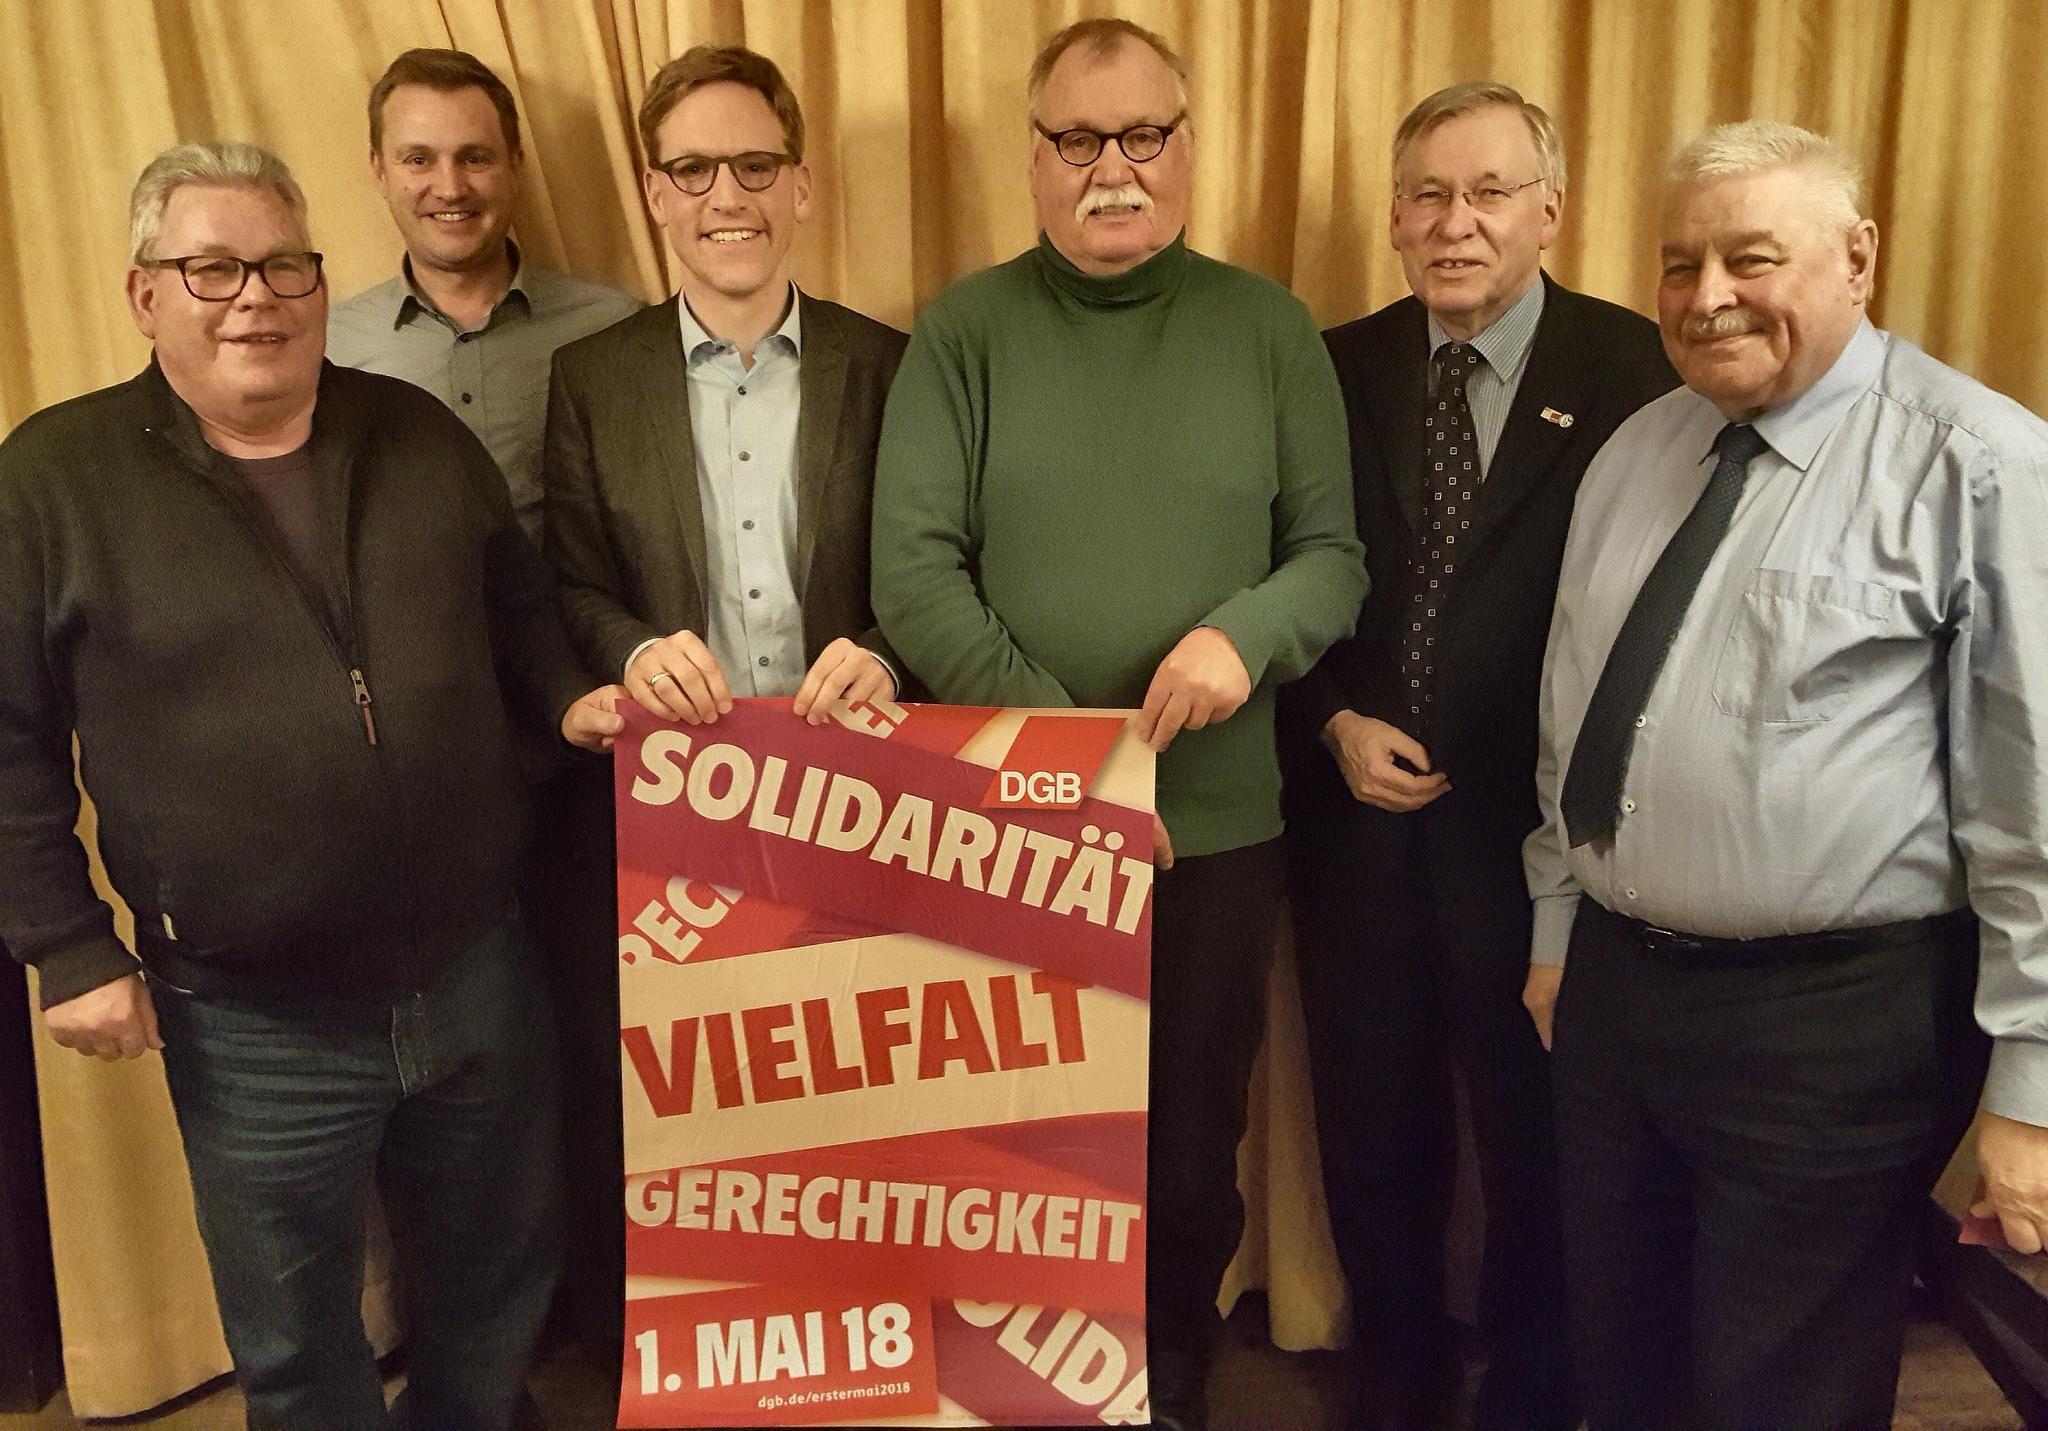 Gespräch KV Coesfeld mit MdB Henrichmann